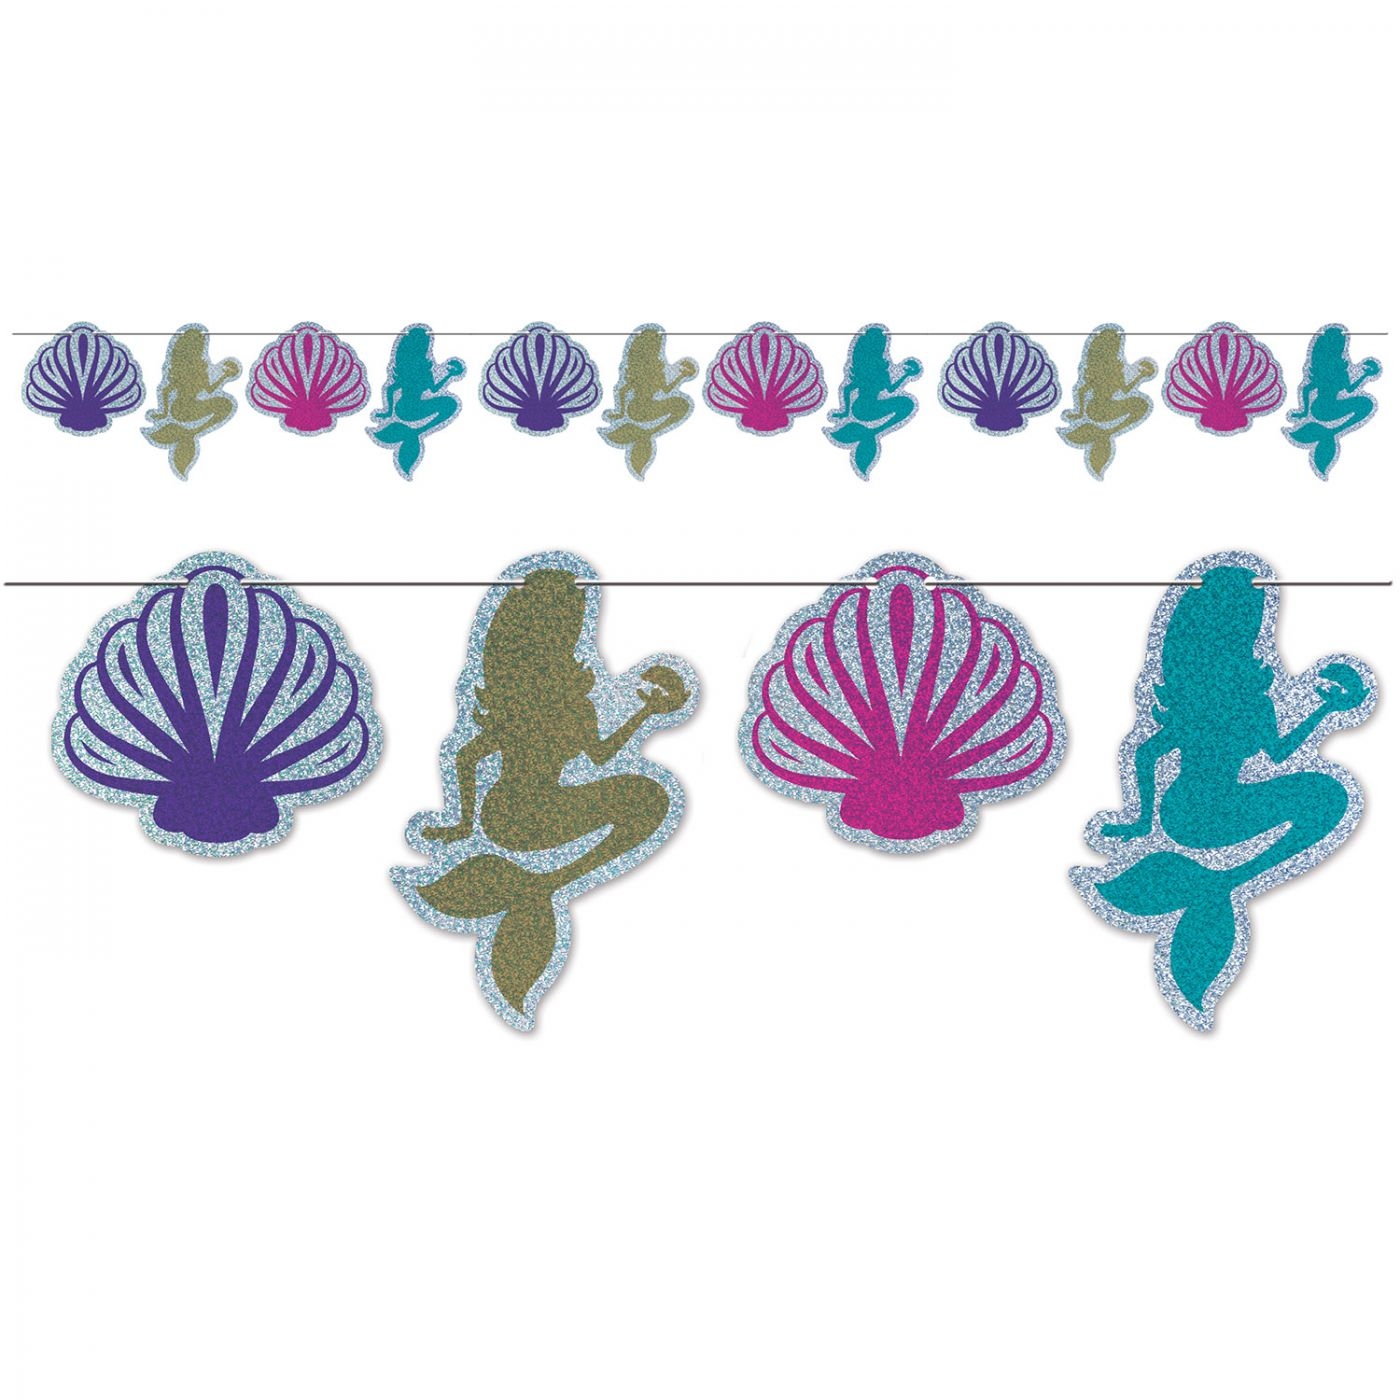 Mermaid & Seashell Streamer image